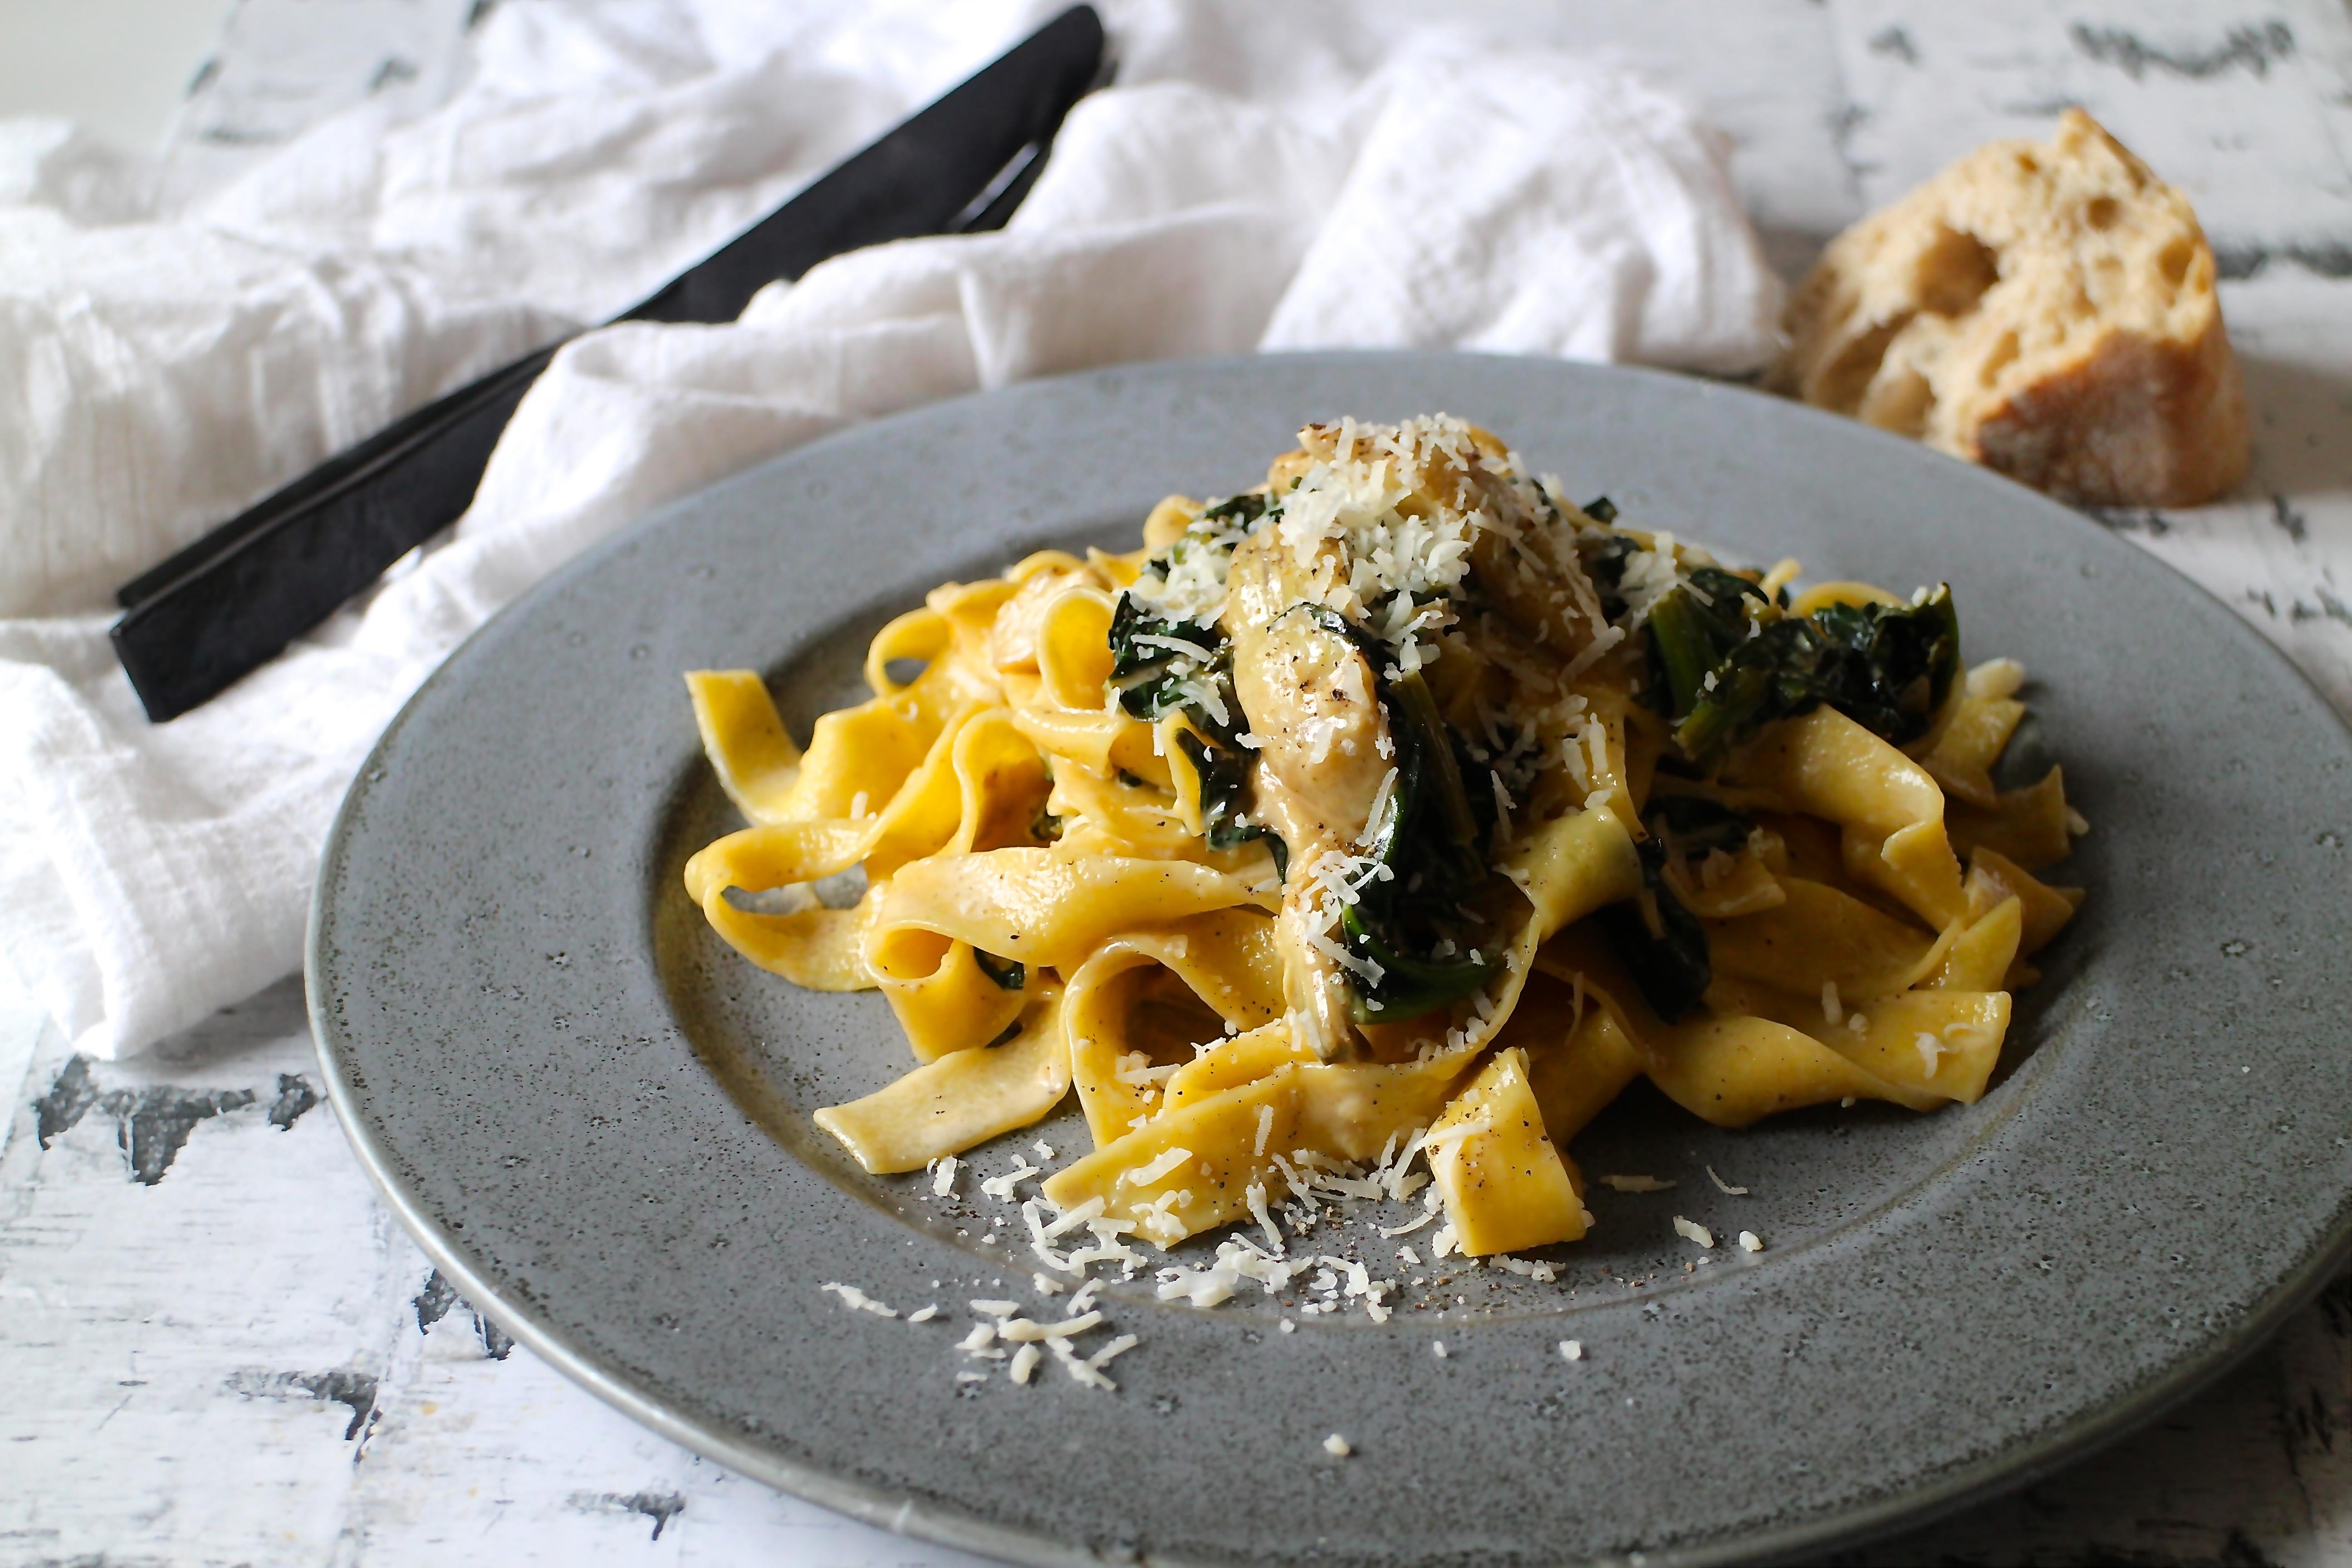 Pasta med artiskok og spinat